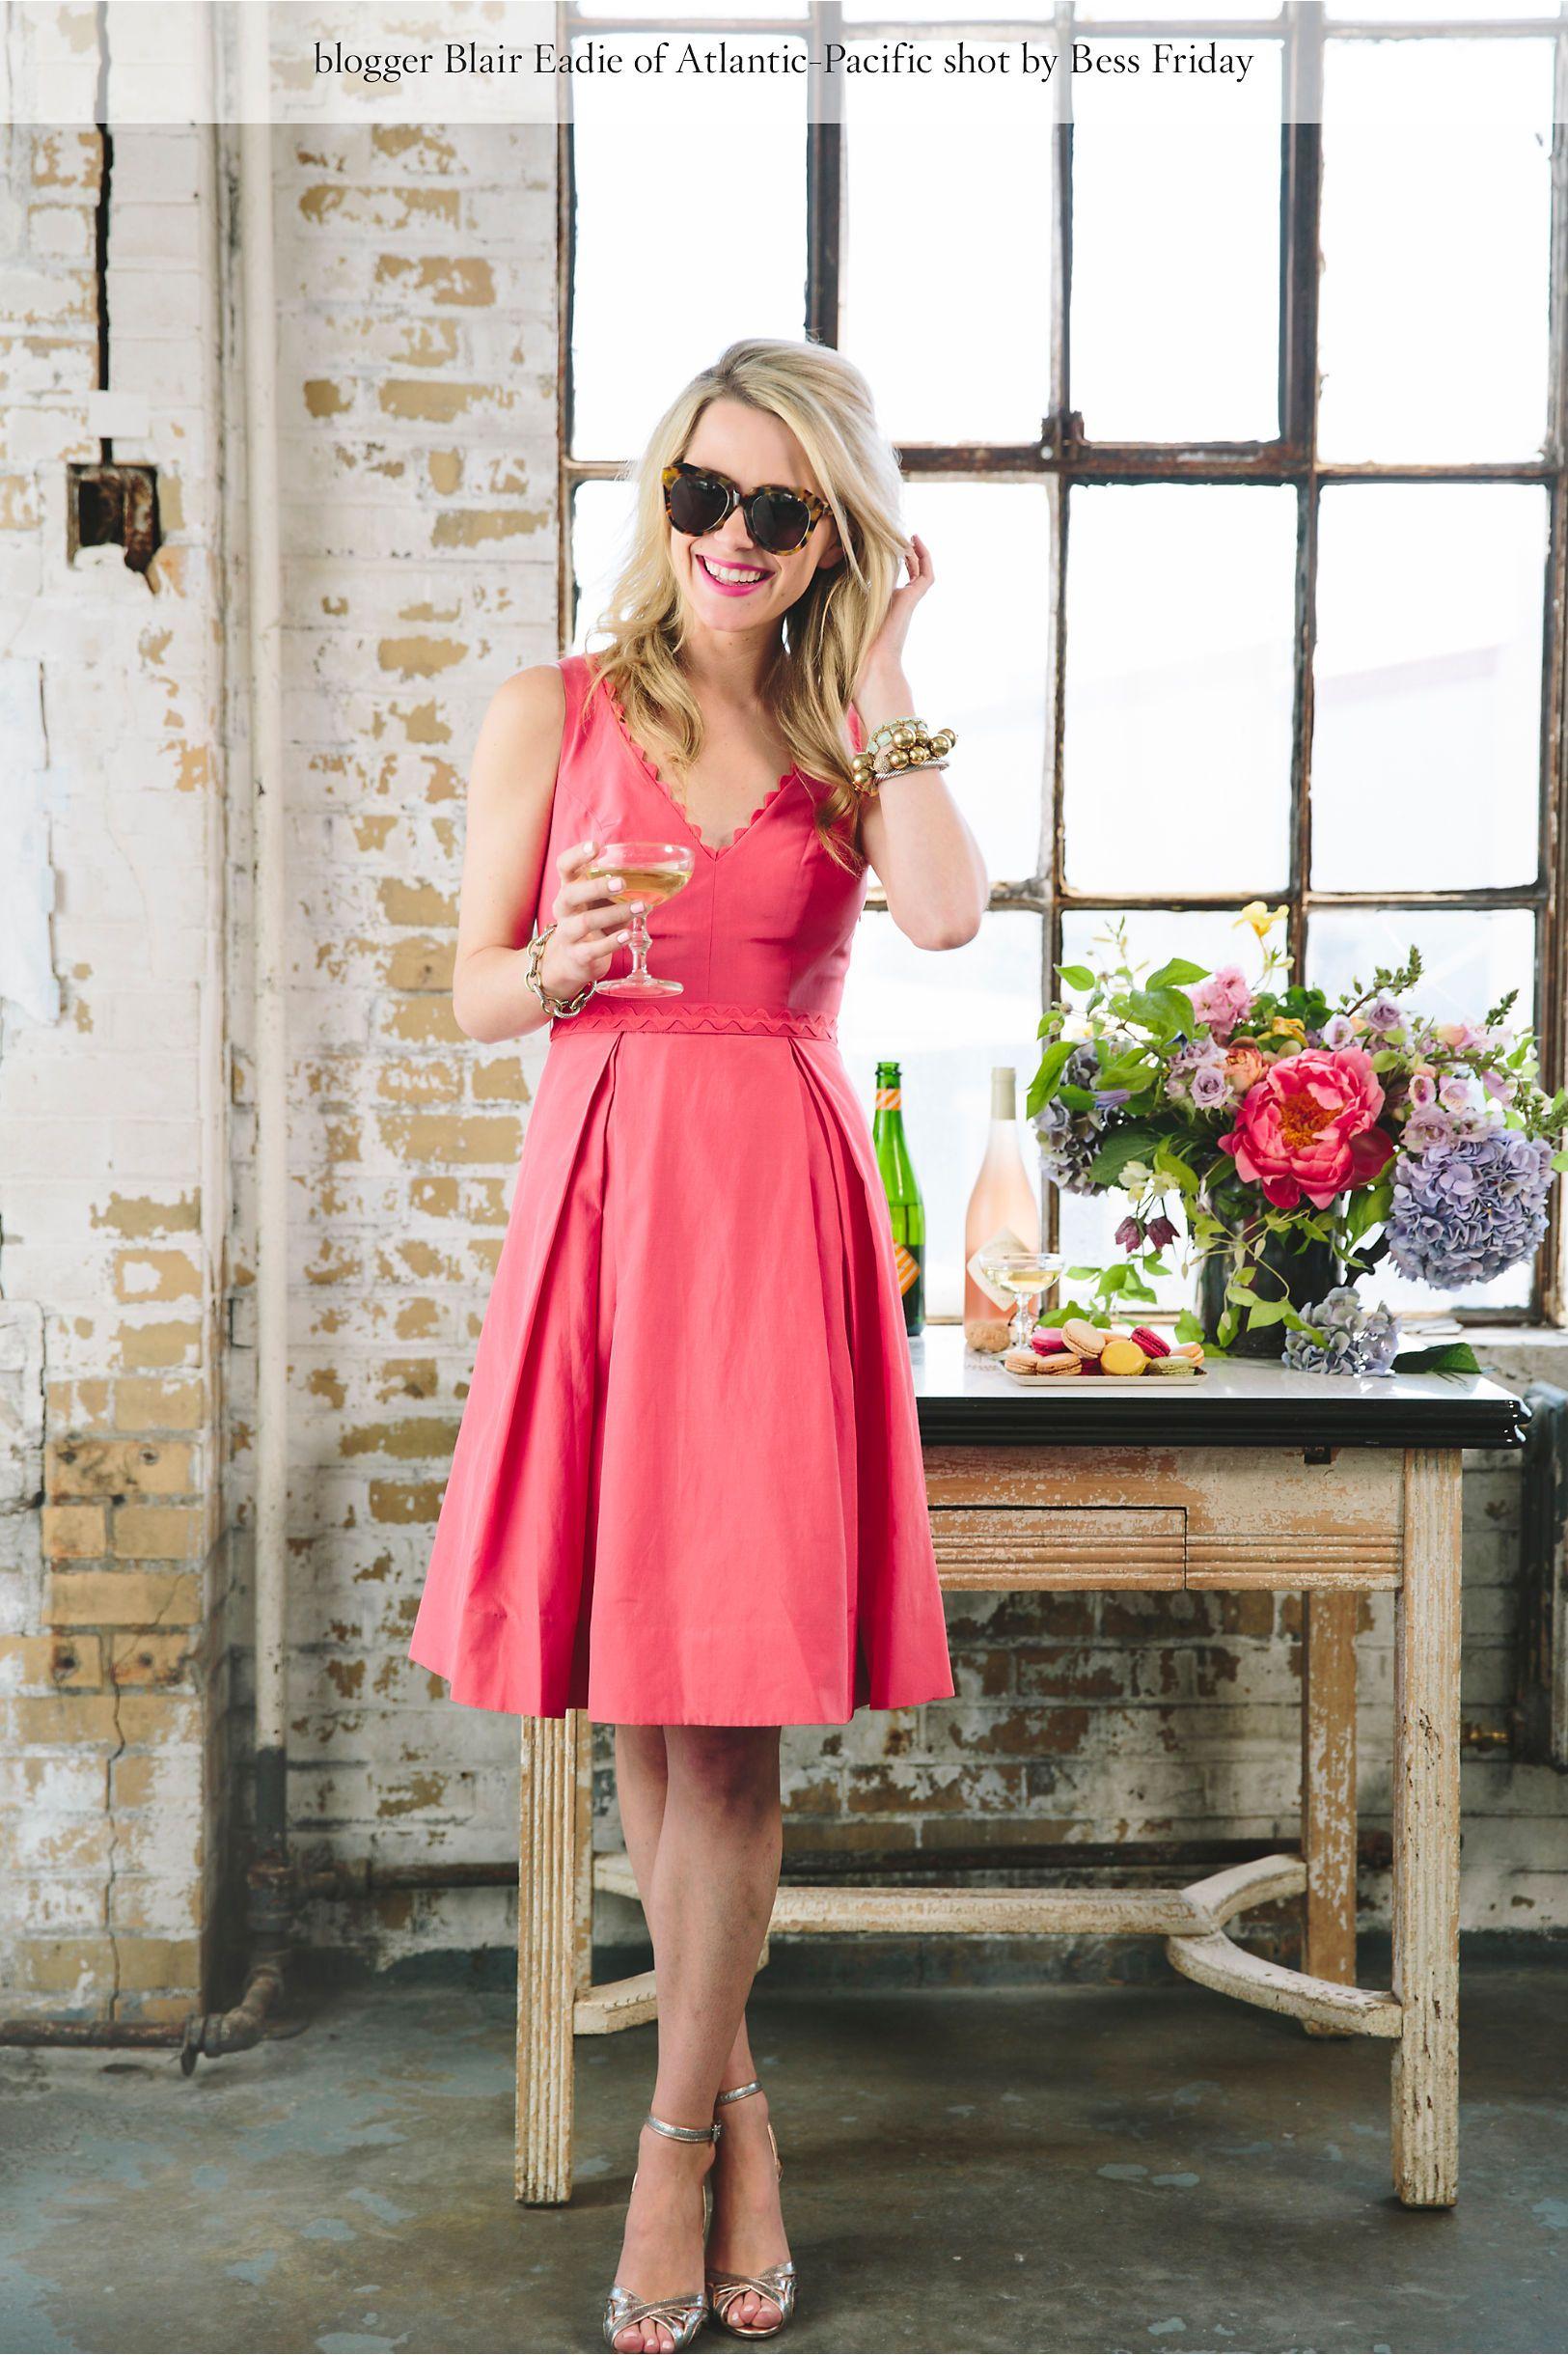 Guest of wedding dresses summer  Supper Club Sandals from BHLDN  Wedding u Events  Pinterest  Best